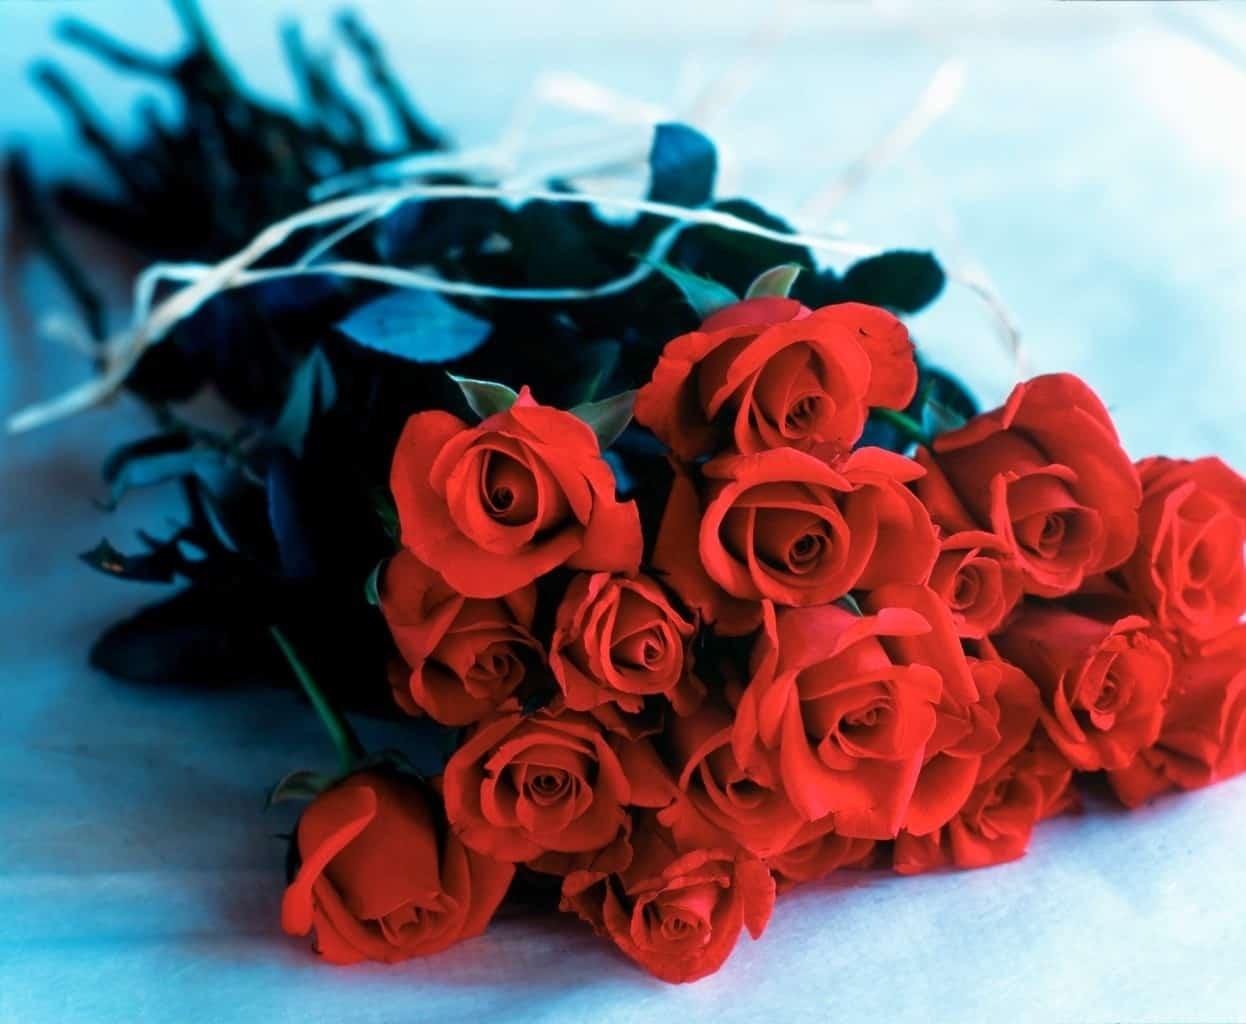 97c9669c01b9143a268bf27097877607 - ▷ Doce rosas 📖